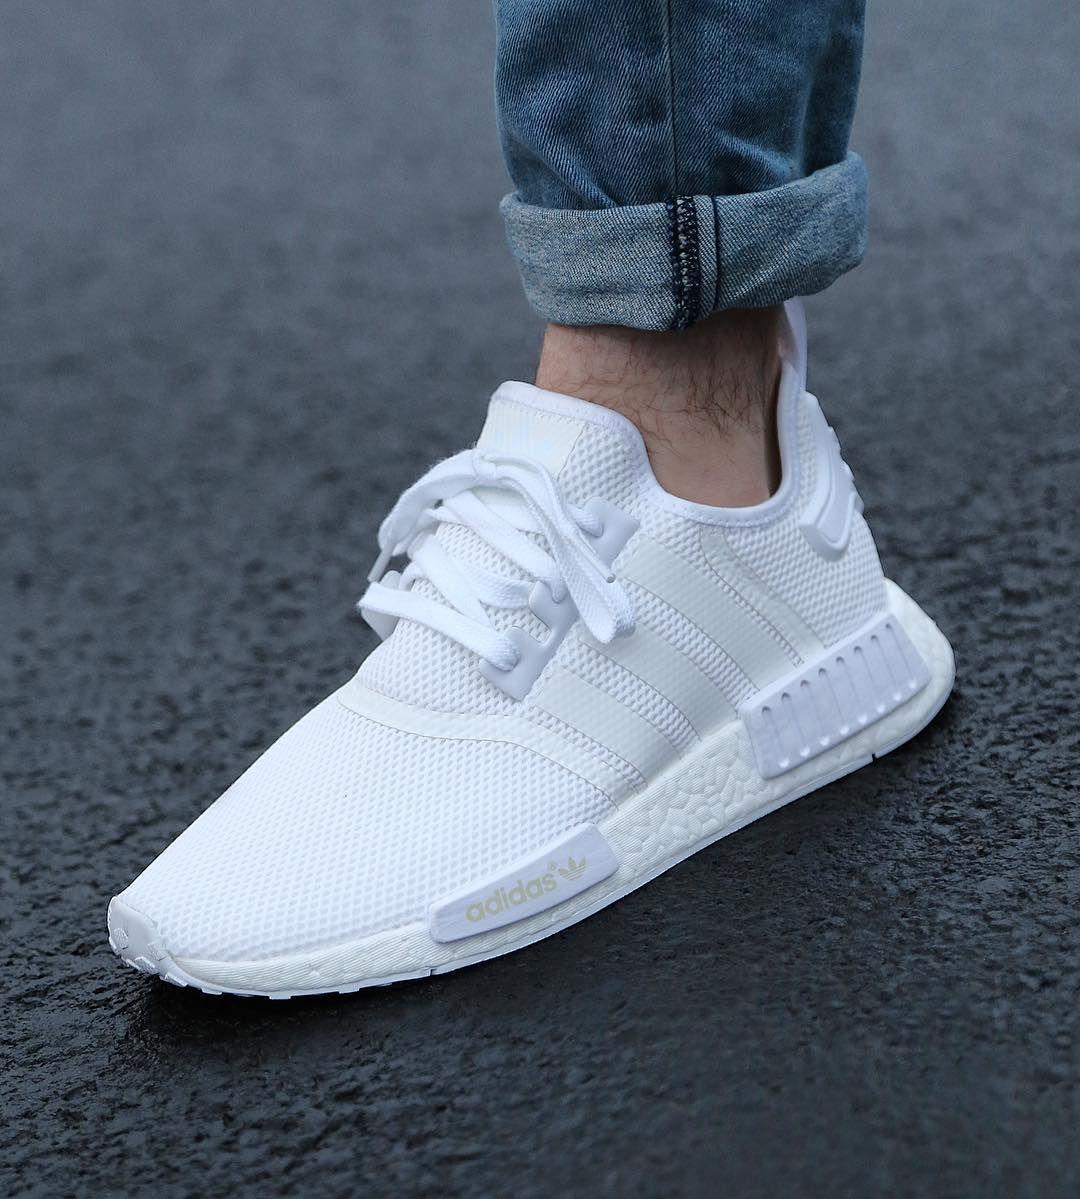 5abce2cfe0ce adidas shirt white ripped denim jeans White Adidas Shoes Mens